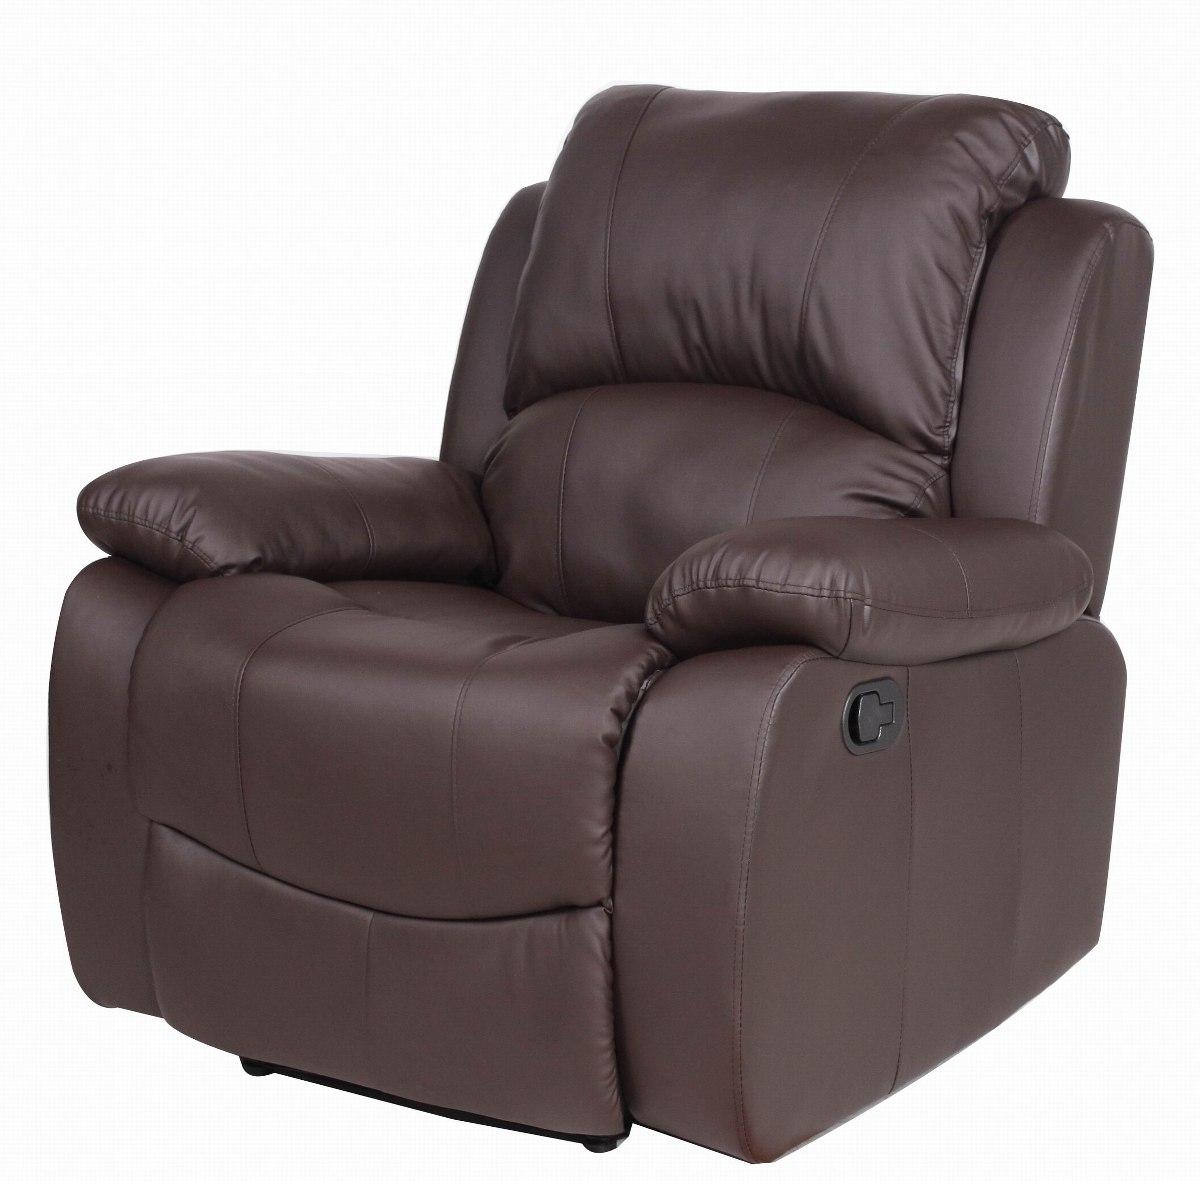 Butaca Reclinable E9dx Sillon sofa butaca Reclinable Odidad Y Calidad 9 990 00 En